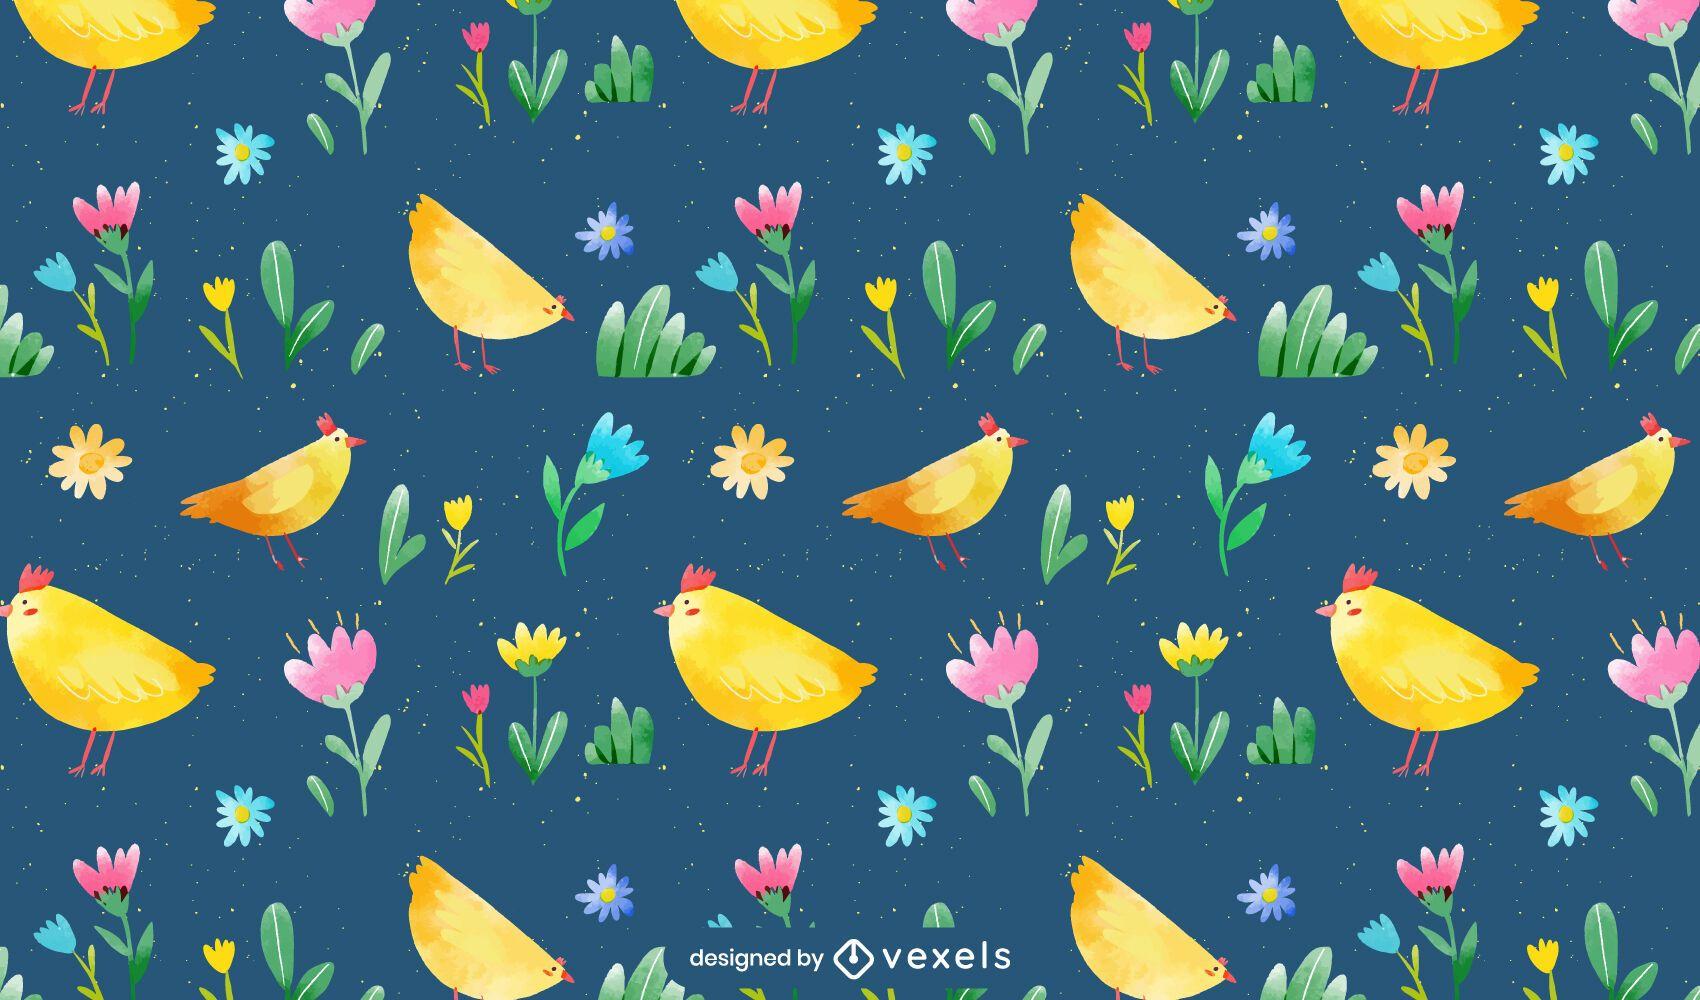 Watercolor chickens pattern design